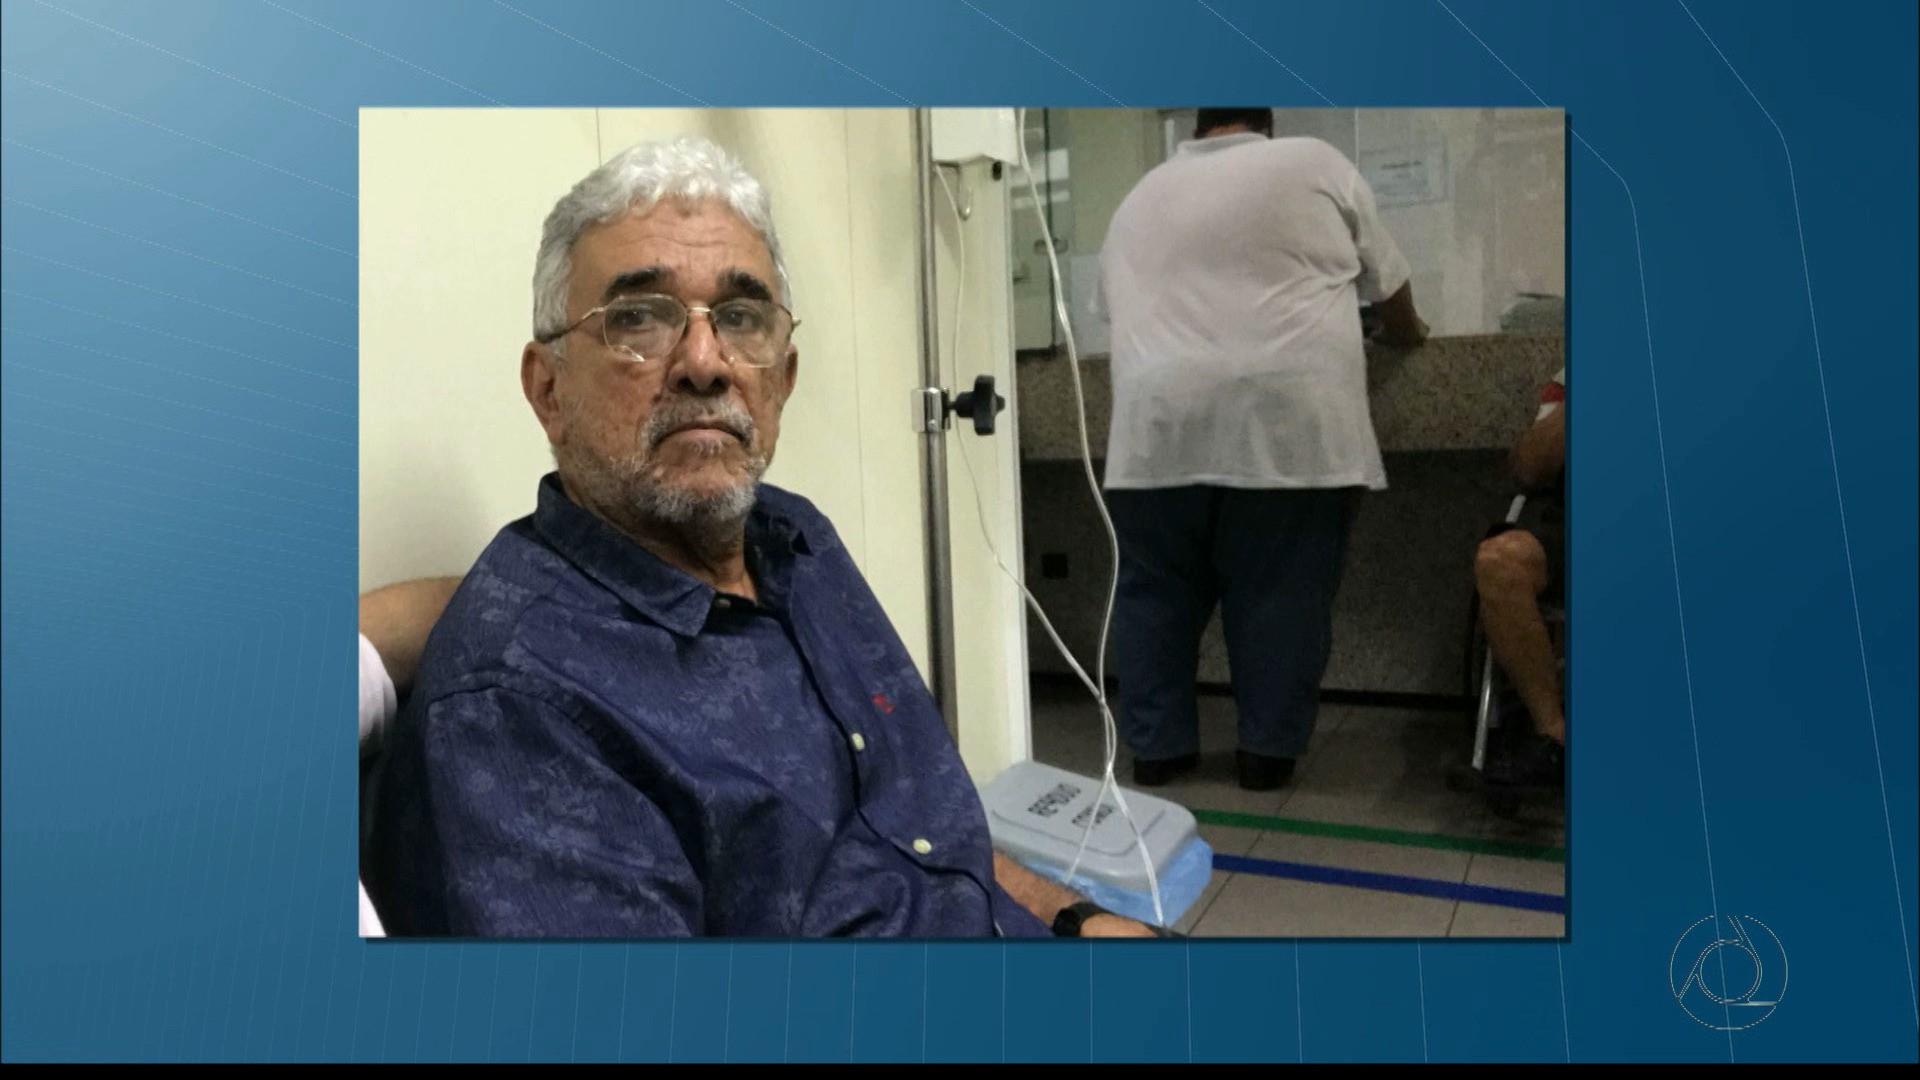 VÍDEOS: JPB 1ª Edição (TV Cabo Branco) desta terça-feira, 17 de julho